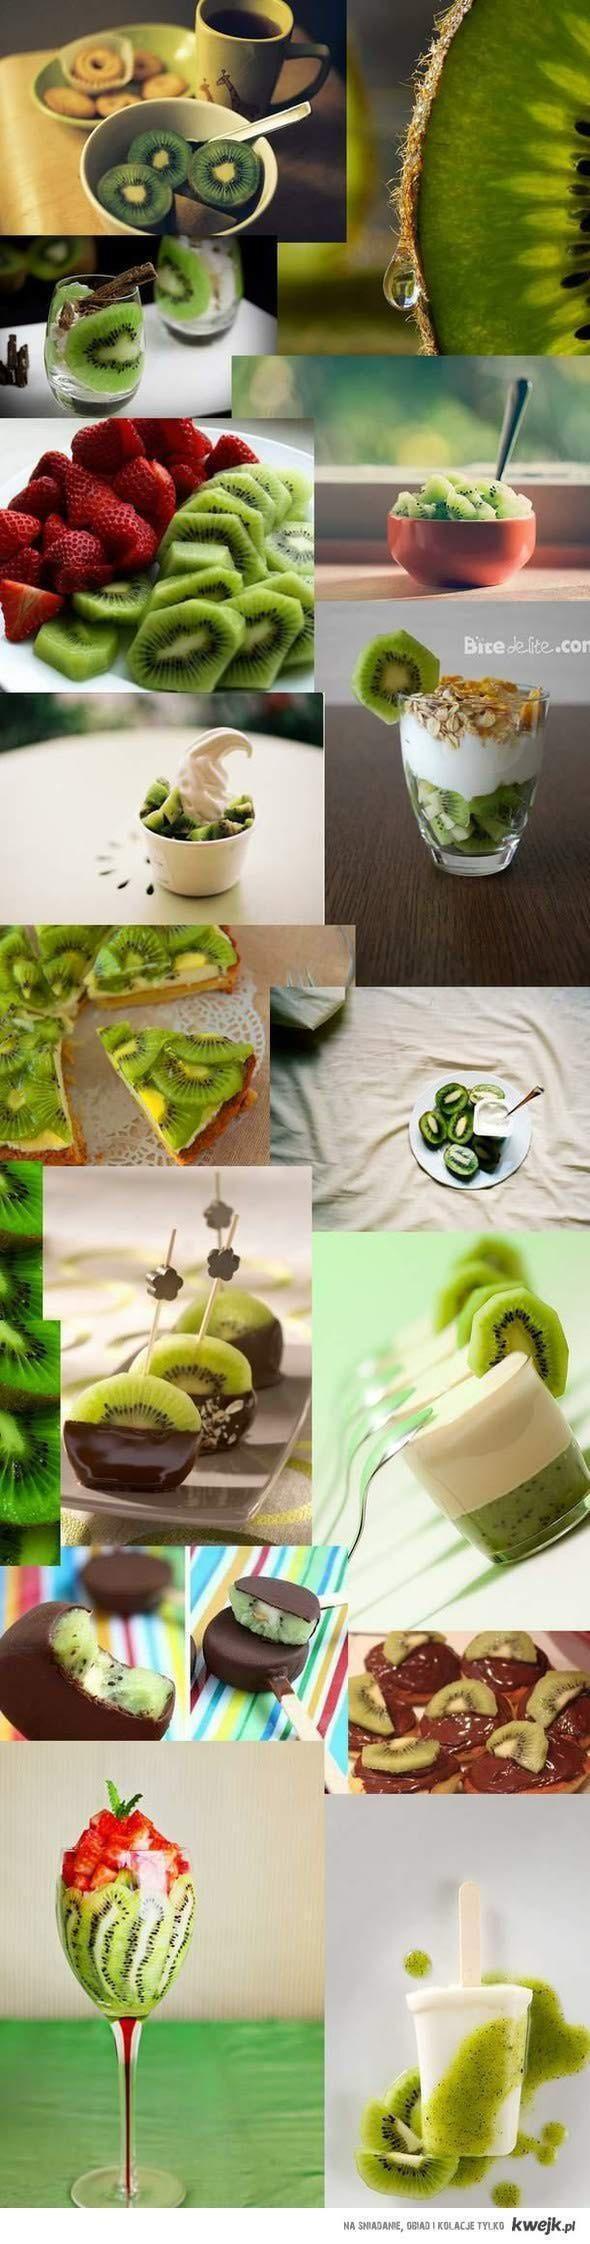 Pinspire - kiwi ideas (: